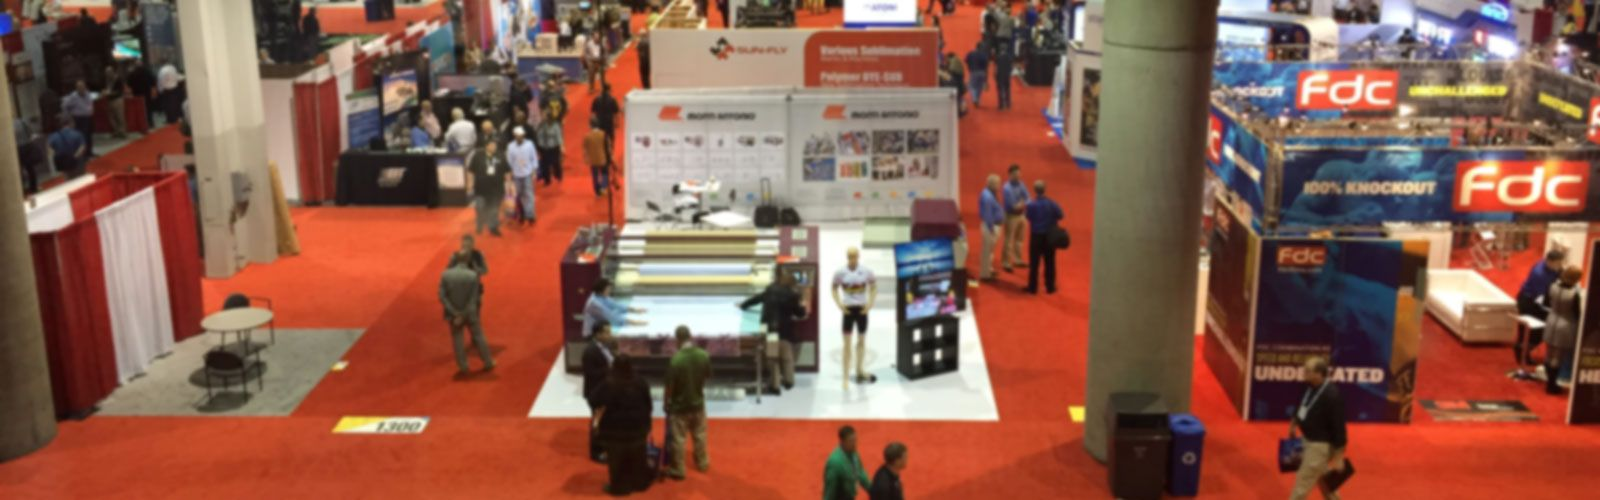 Tradeshow Graphics and Displays